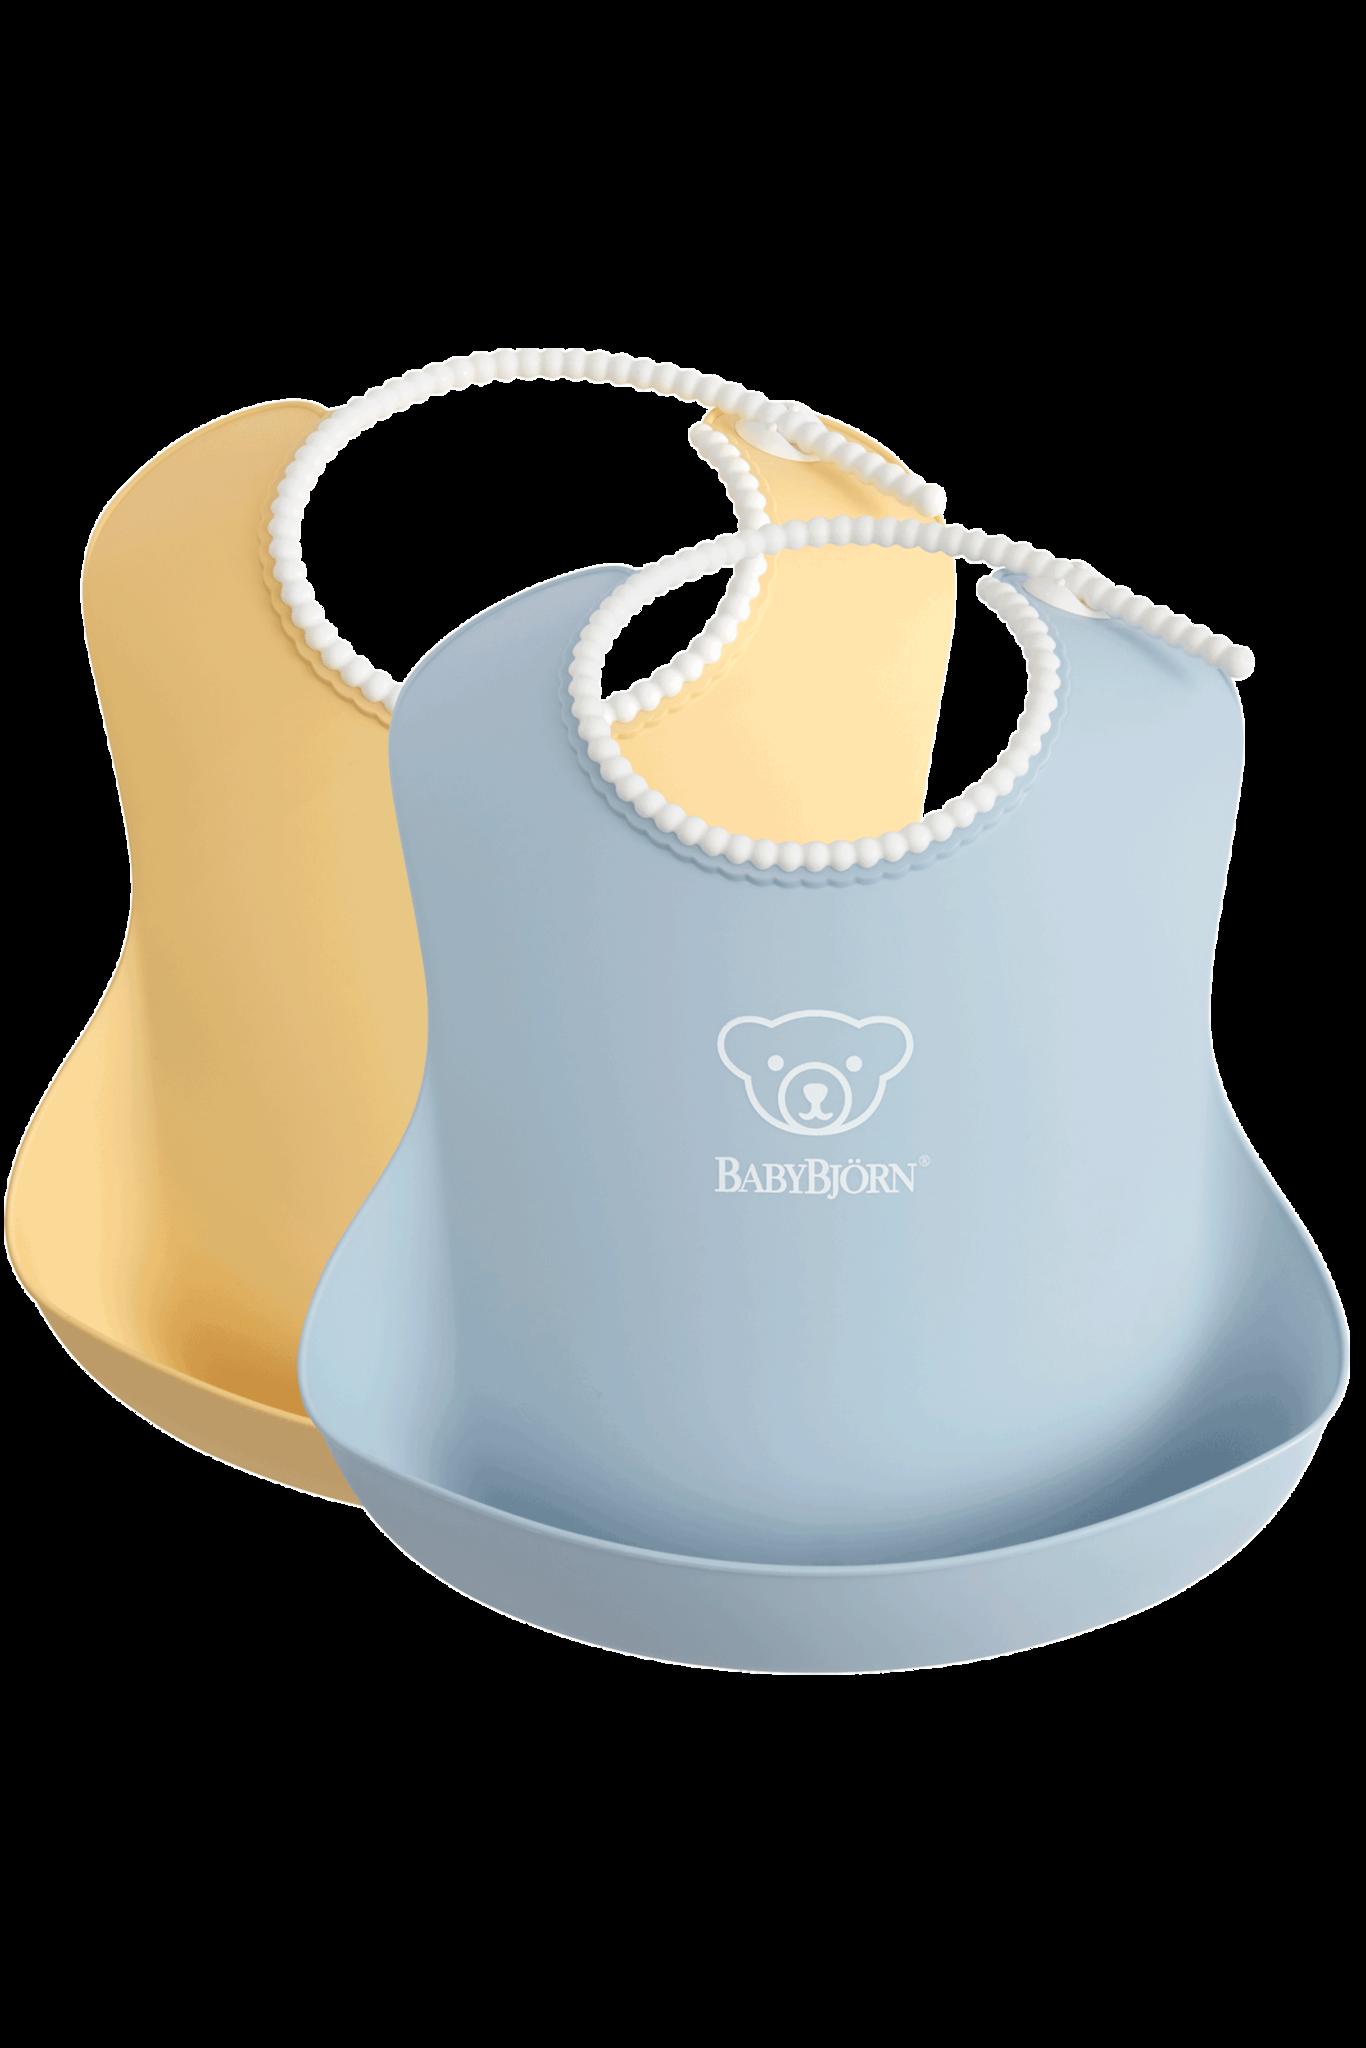 BABYBJÖRN BABYBJÖRN Baby Slab duopack Pastelgeel/Pastelblauw